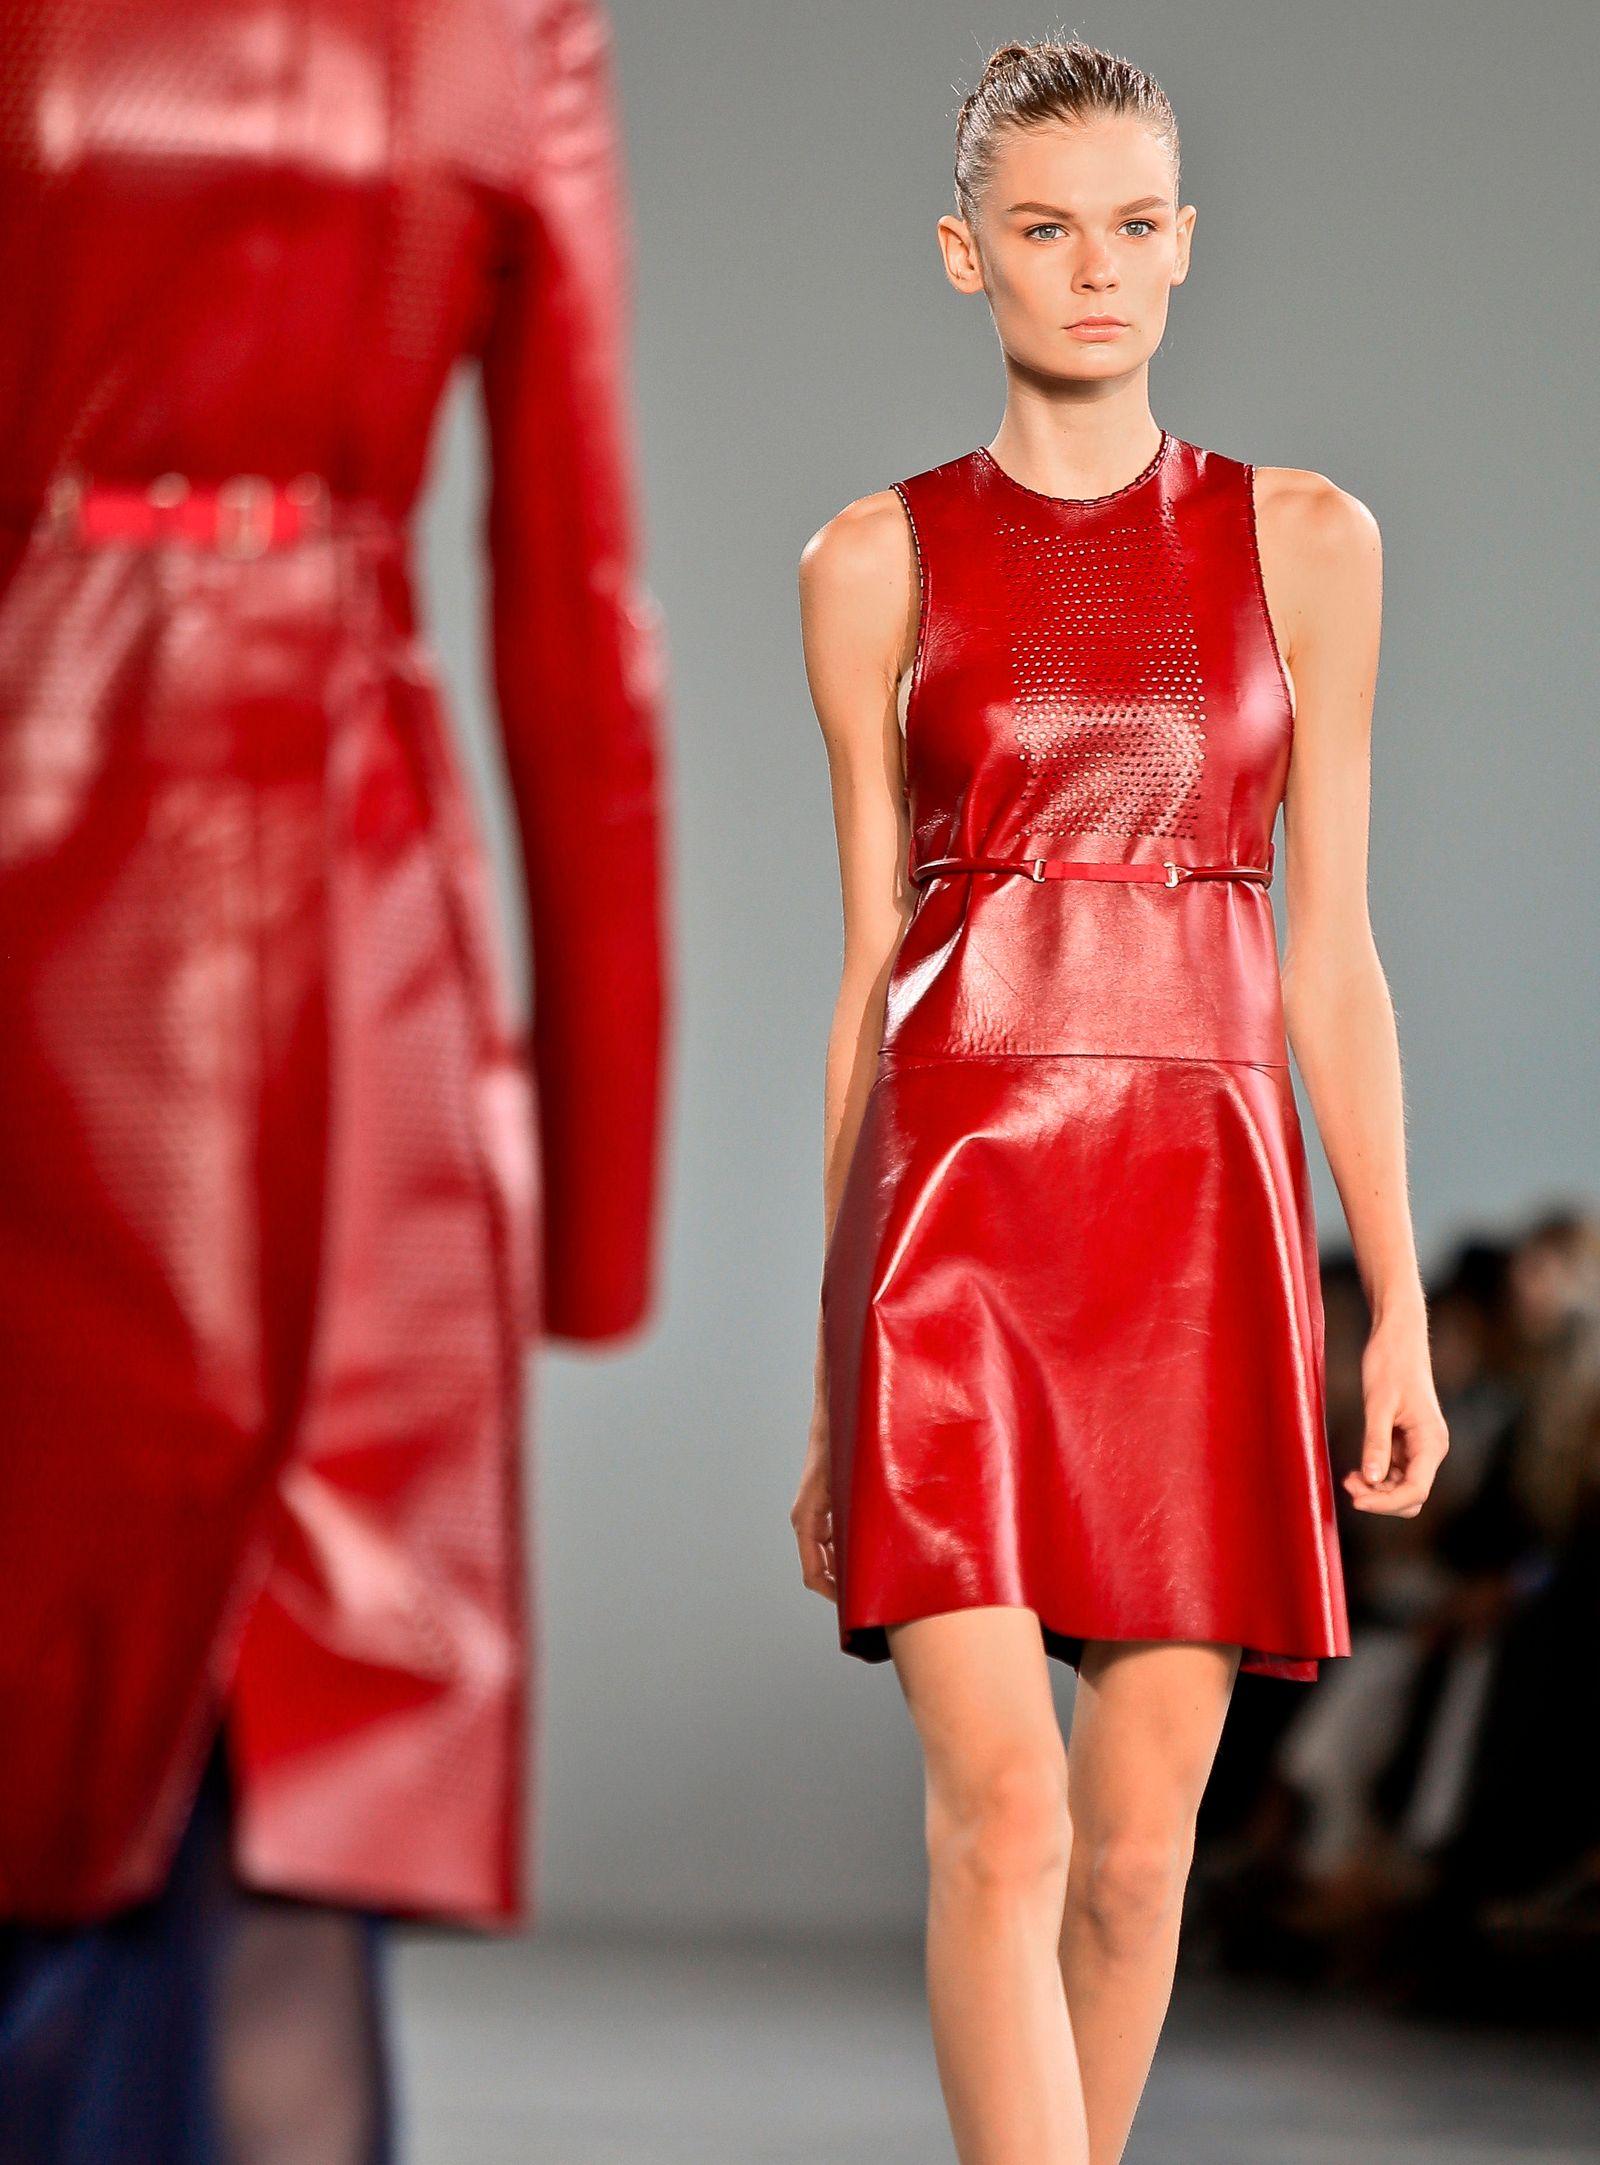 NY Fashion Week Key Shows